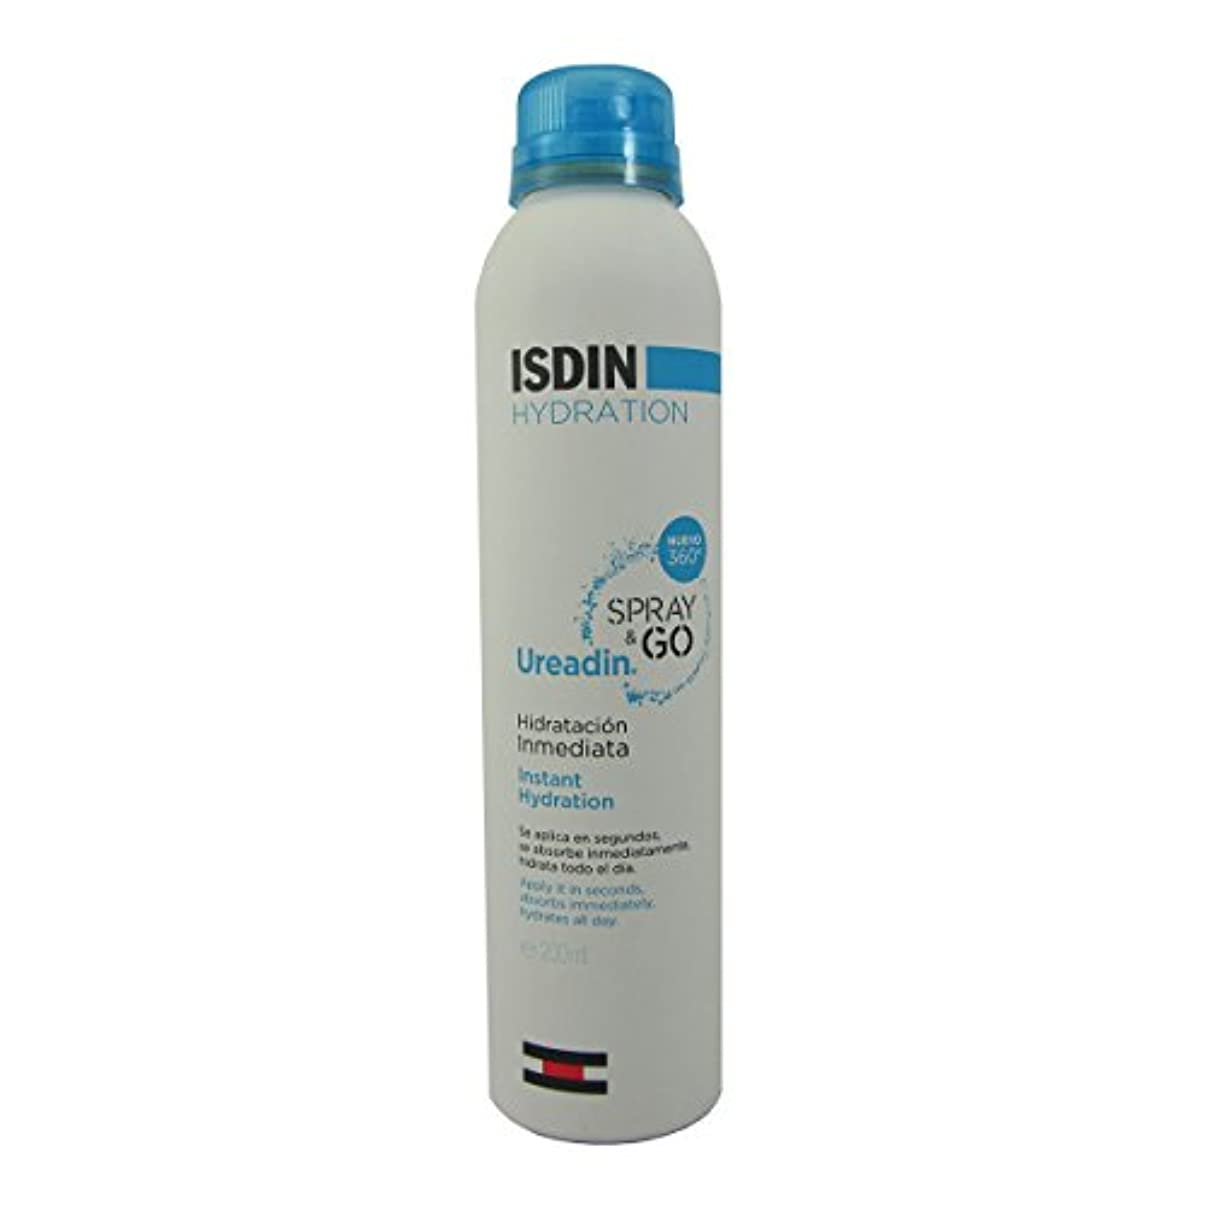 入射作る依存Ureadin Spray And Go Immediate Hydration 200ml [並行輸入品]